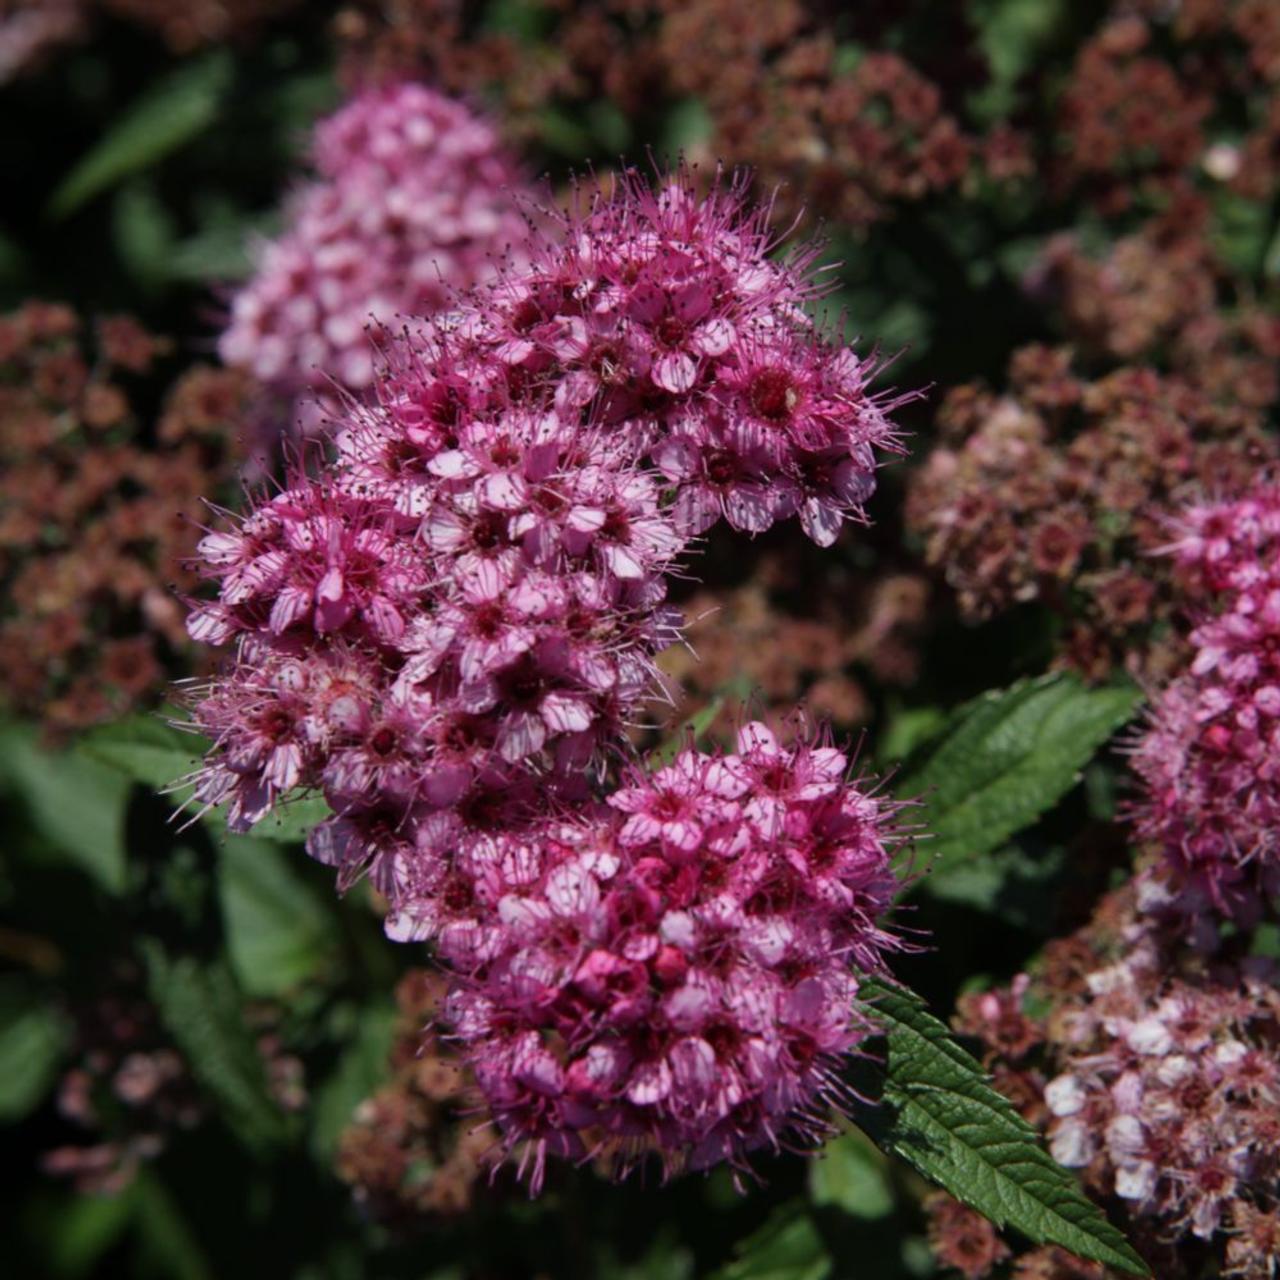 Spiraea japonica 'Dart's Red' plant